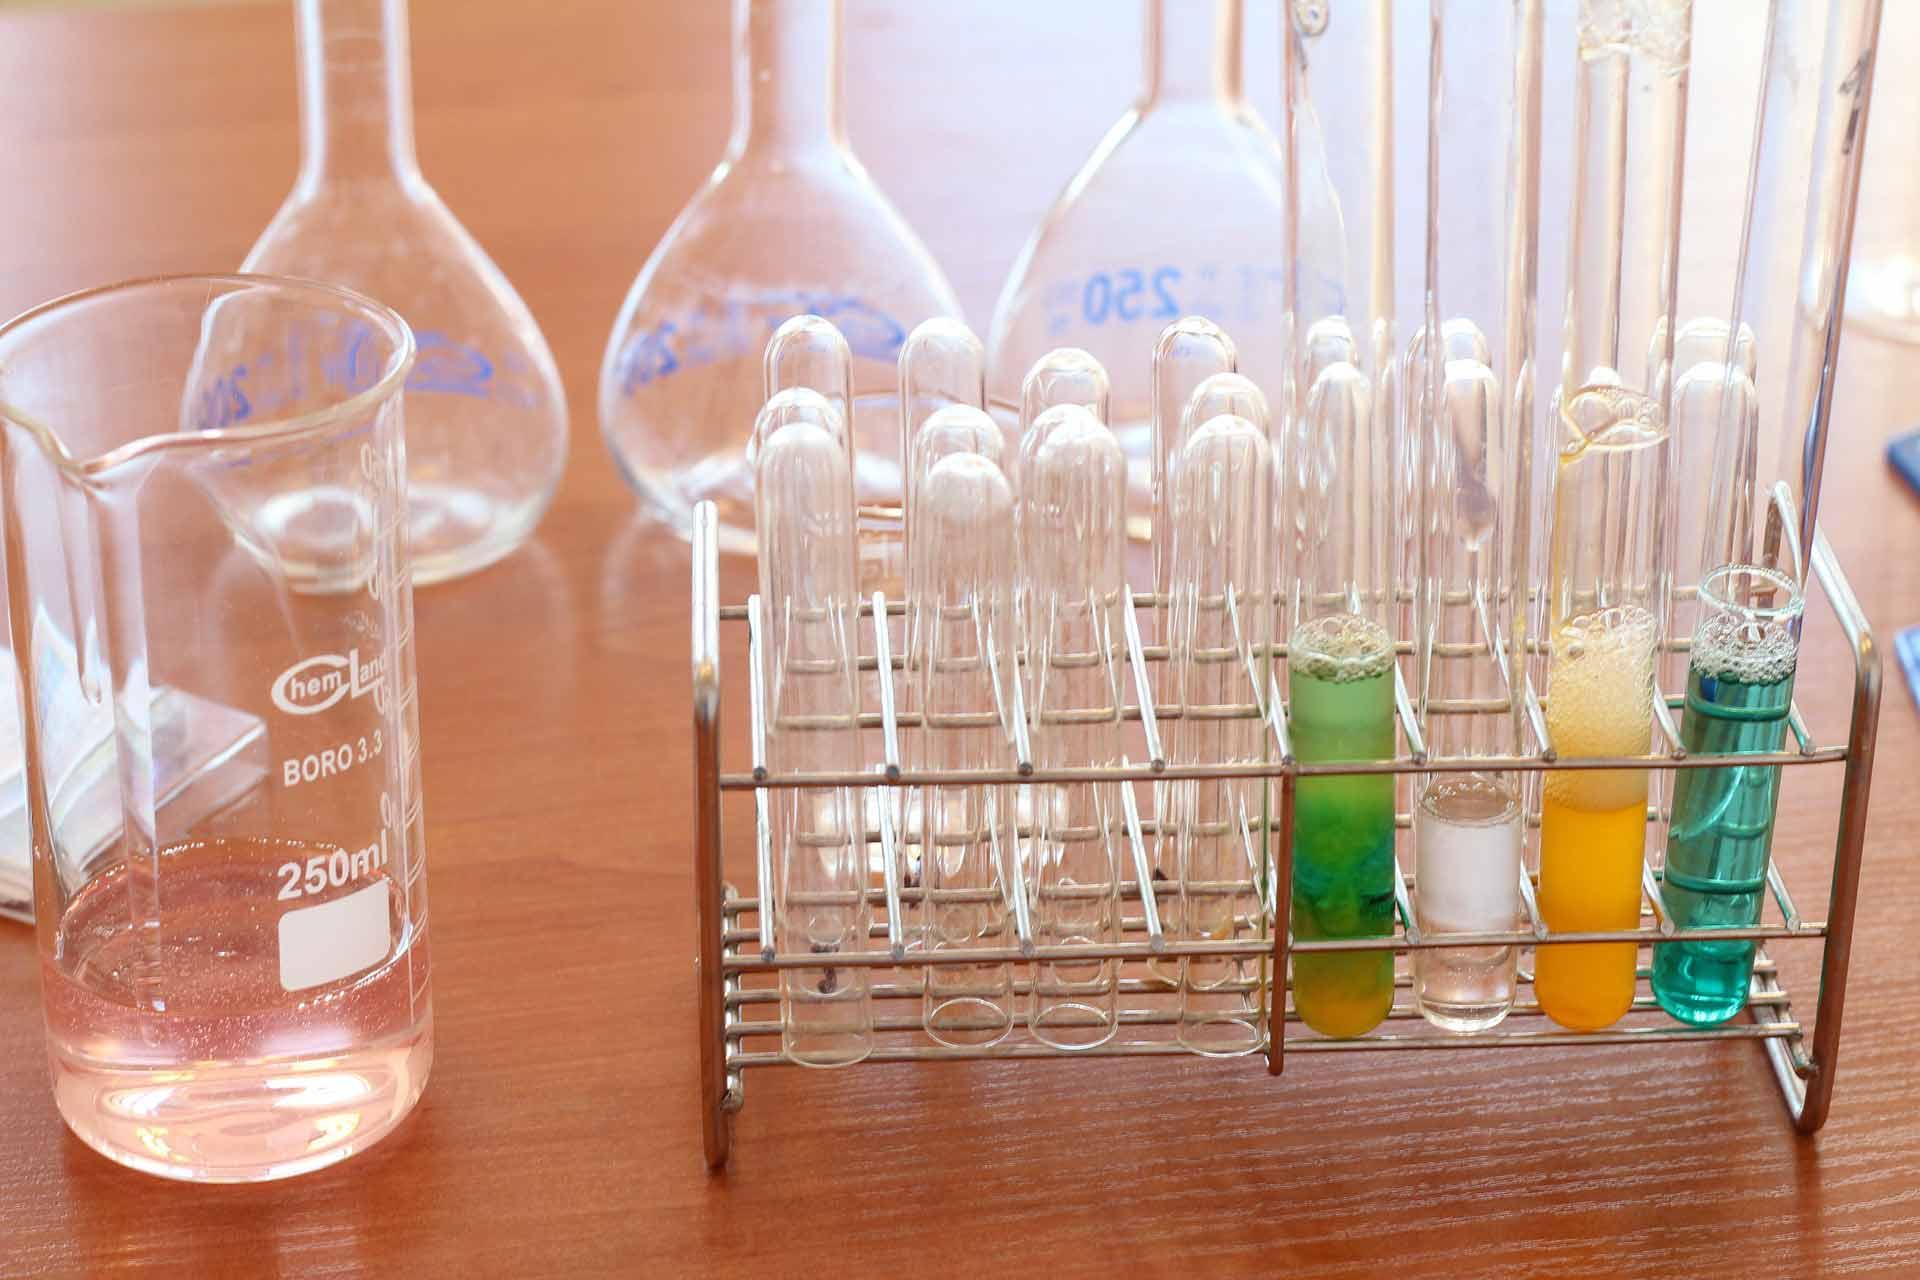 HempWorx CBD Oil Certification and Lab Testing